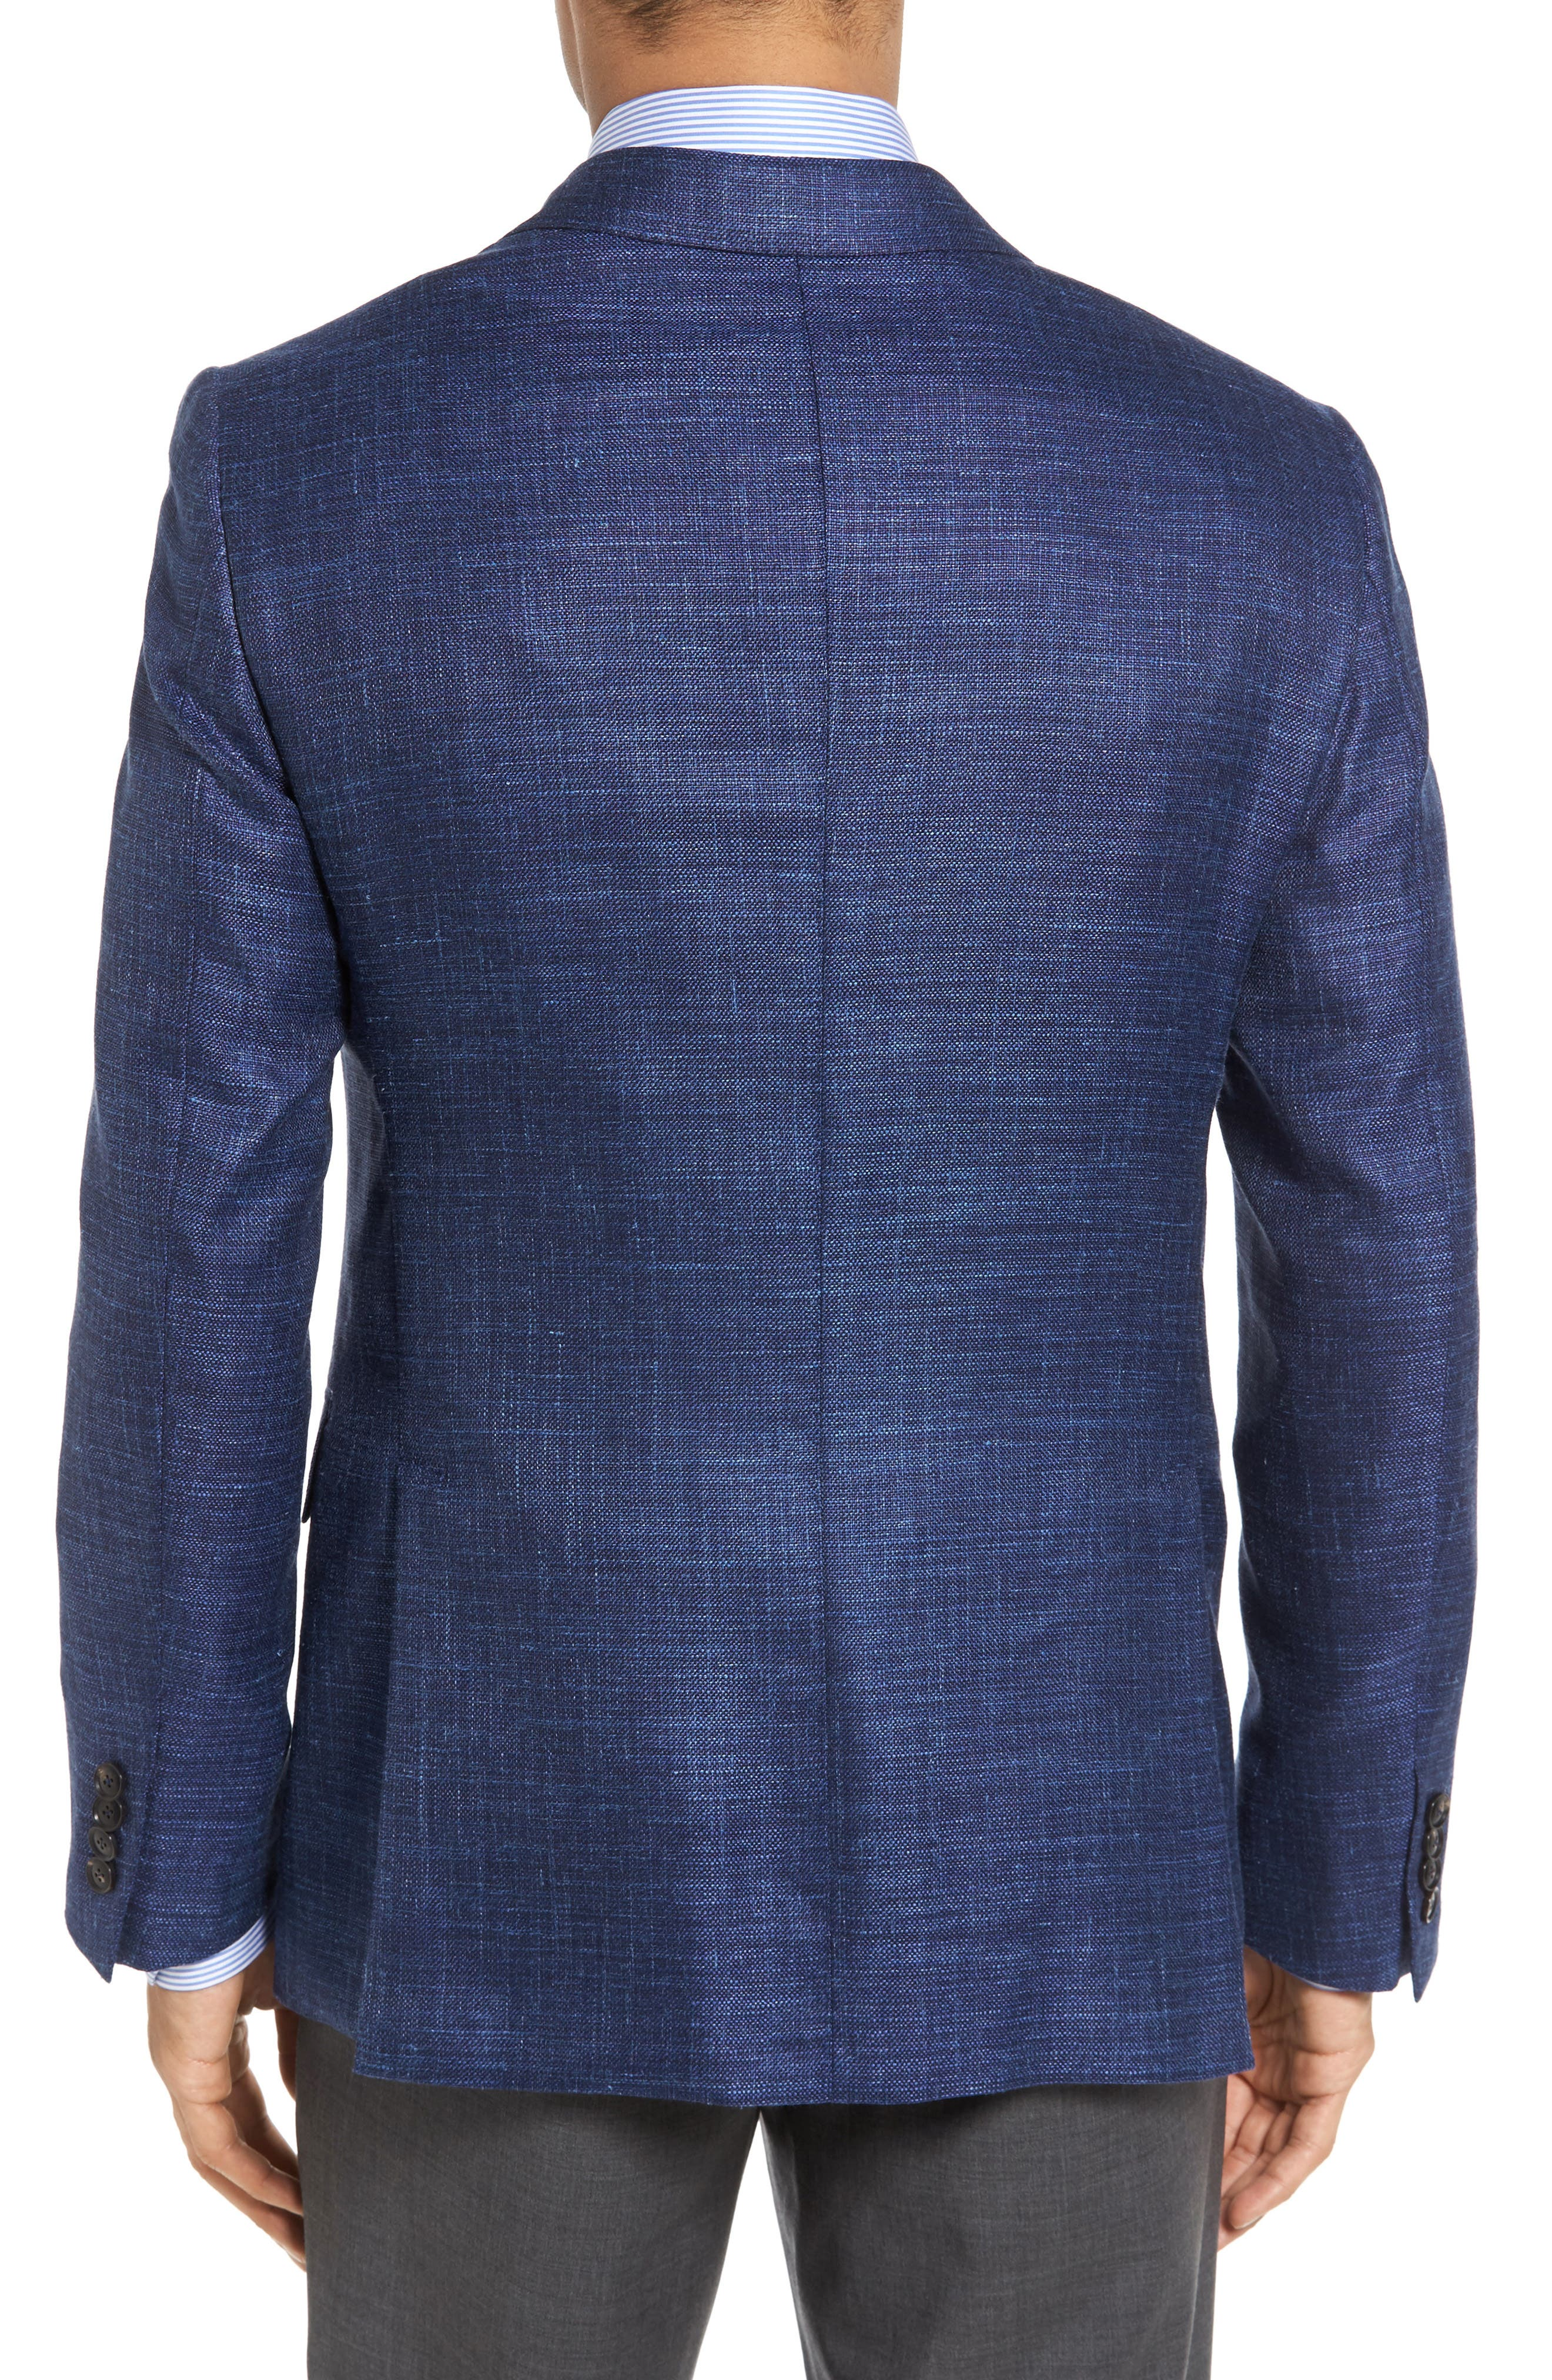 Plaid Wool Blend Blazer,                             Alternate thumbnail 2, color,                             Blue